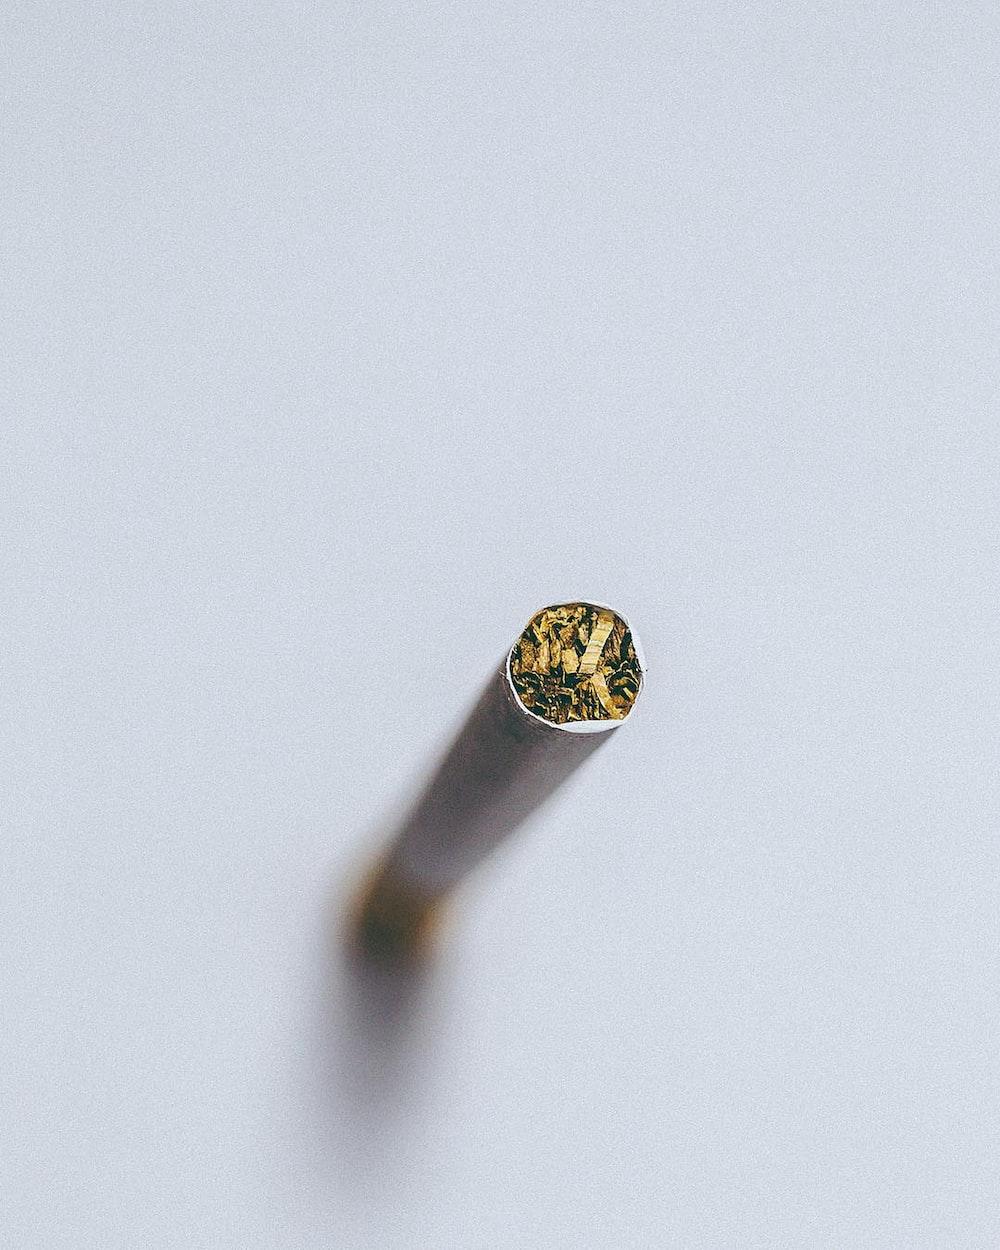 silver diamond ring on white surface